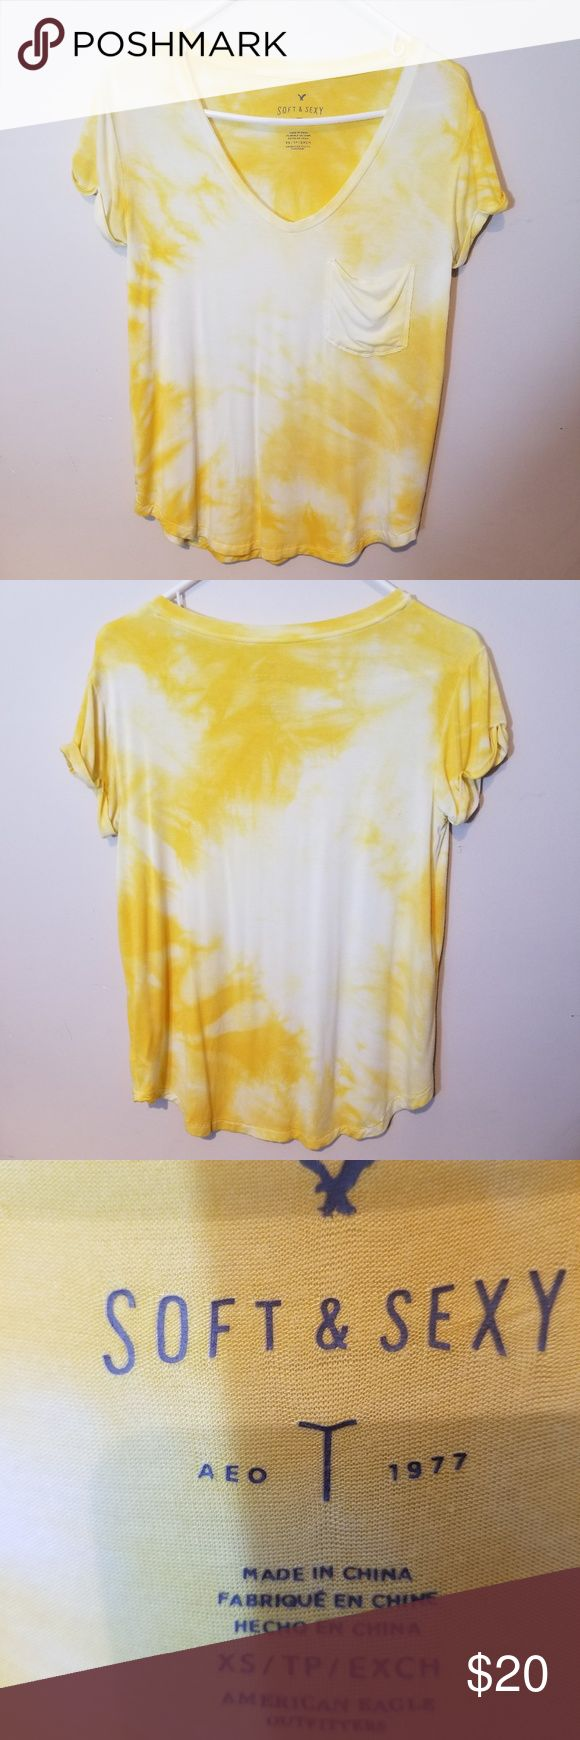 Soft & Sexy Vneck Tie Dye Yellow Top. Soft & Sexy Vneck Tie Dye Yellow Top. Size…